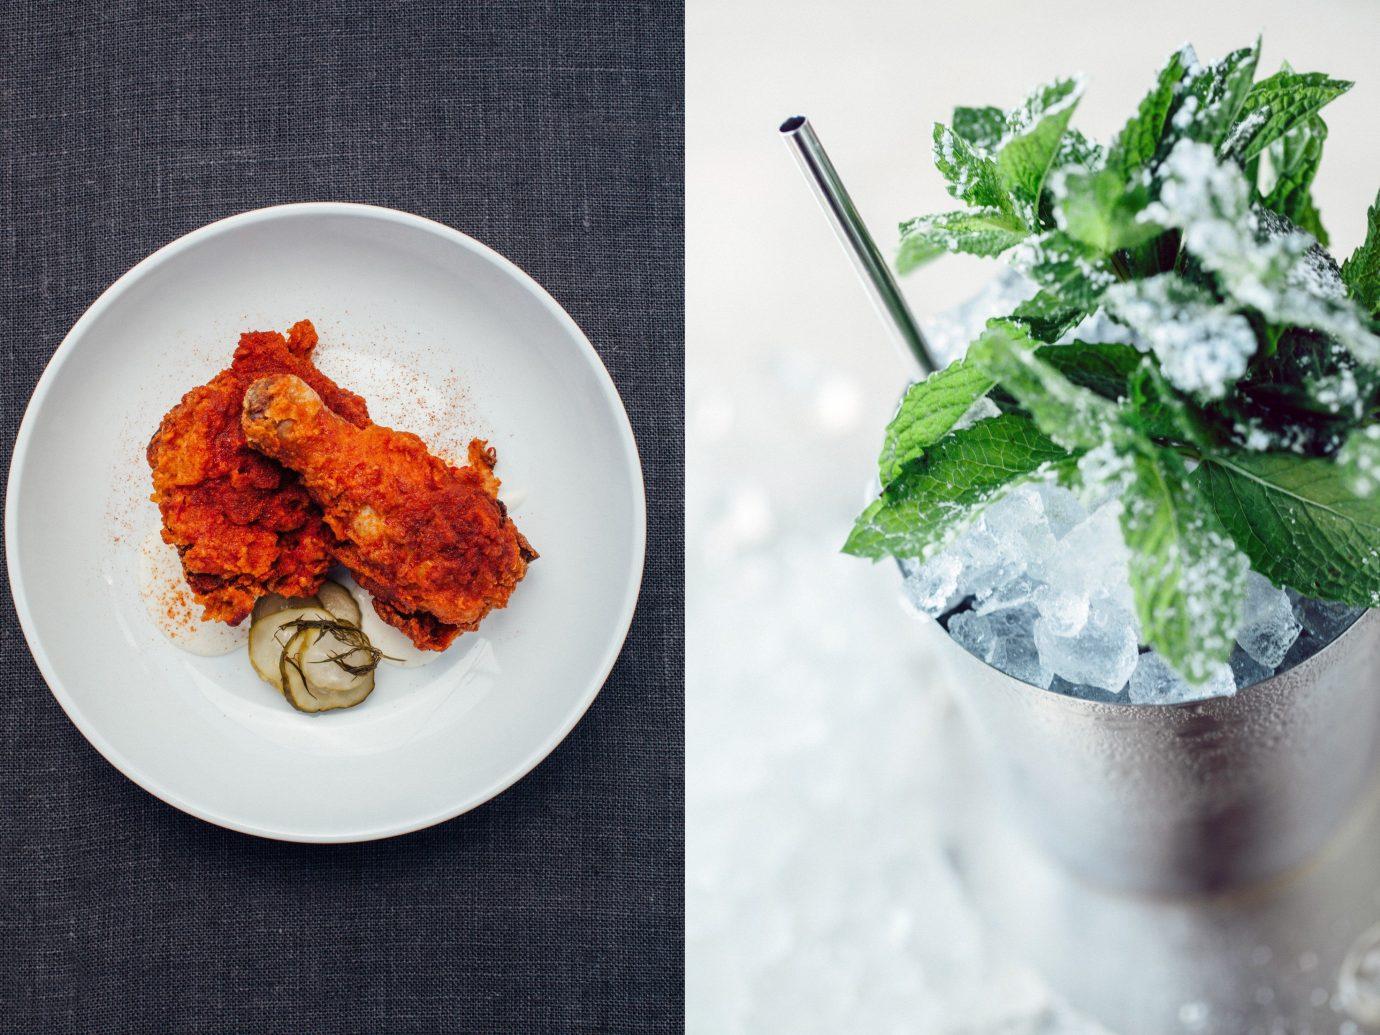 Food + Drink dish plate food produce vegetable meal cuisine flowering plant